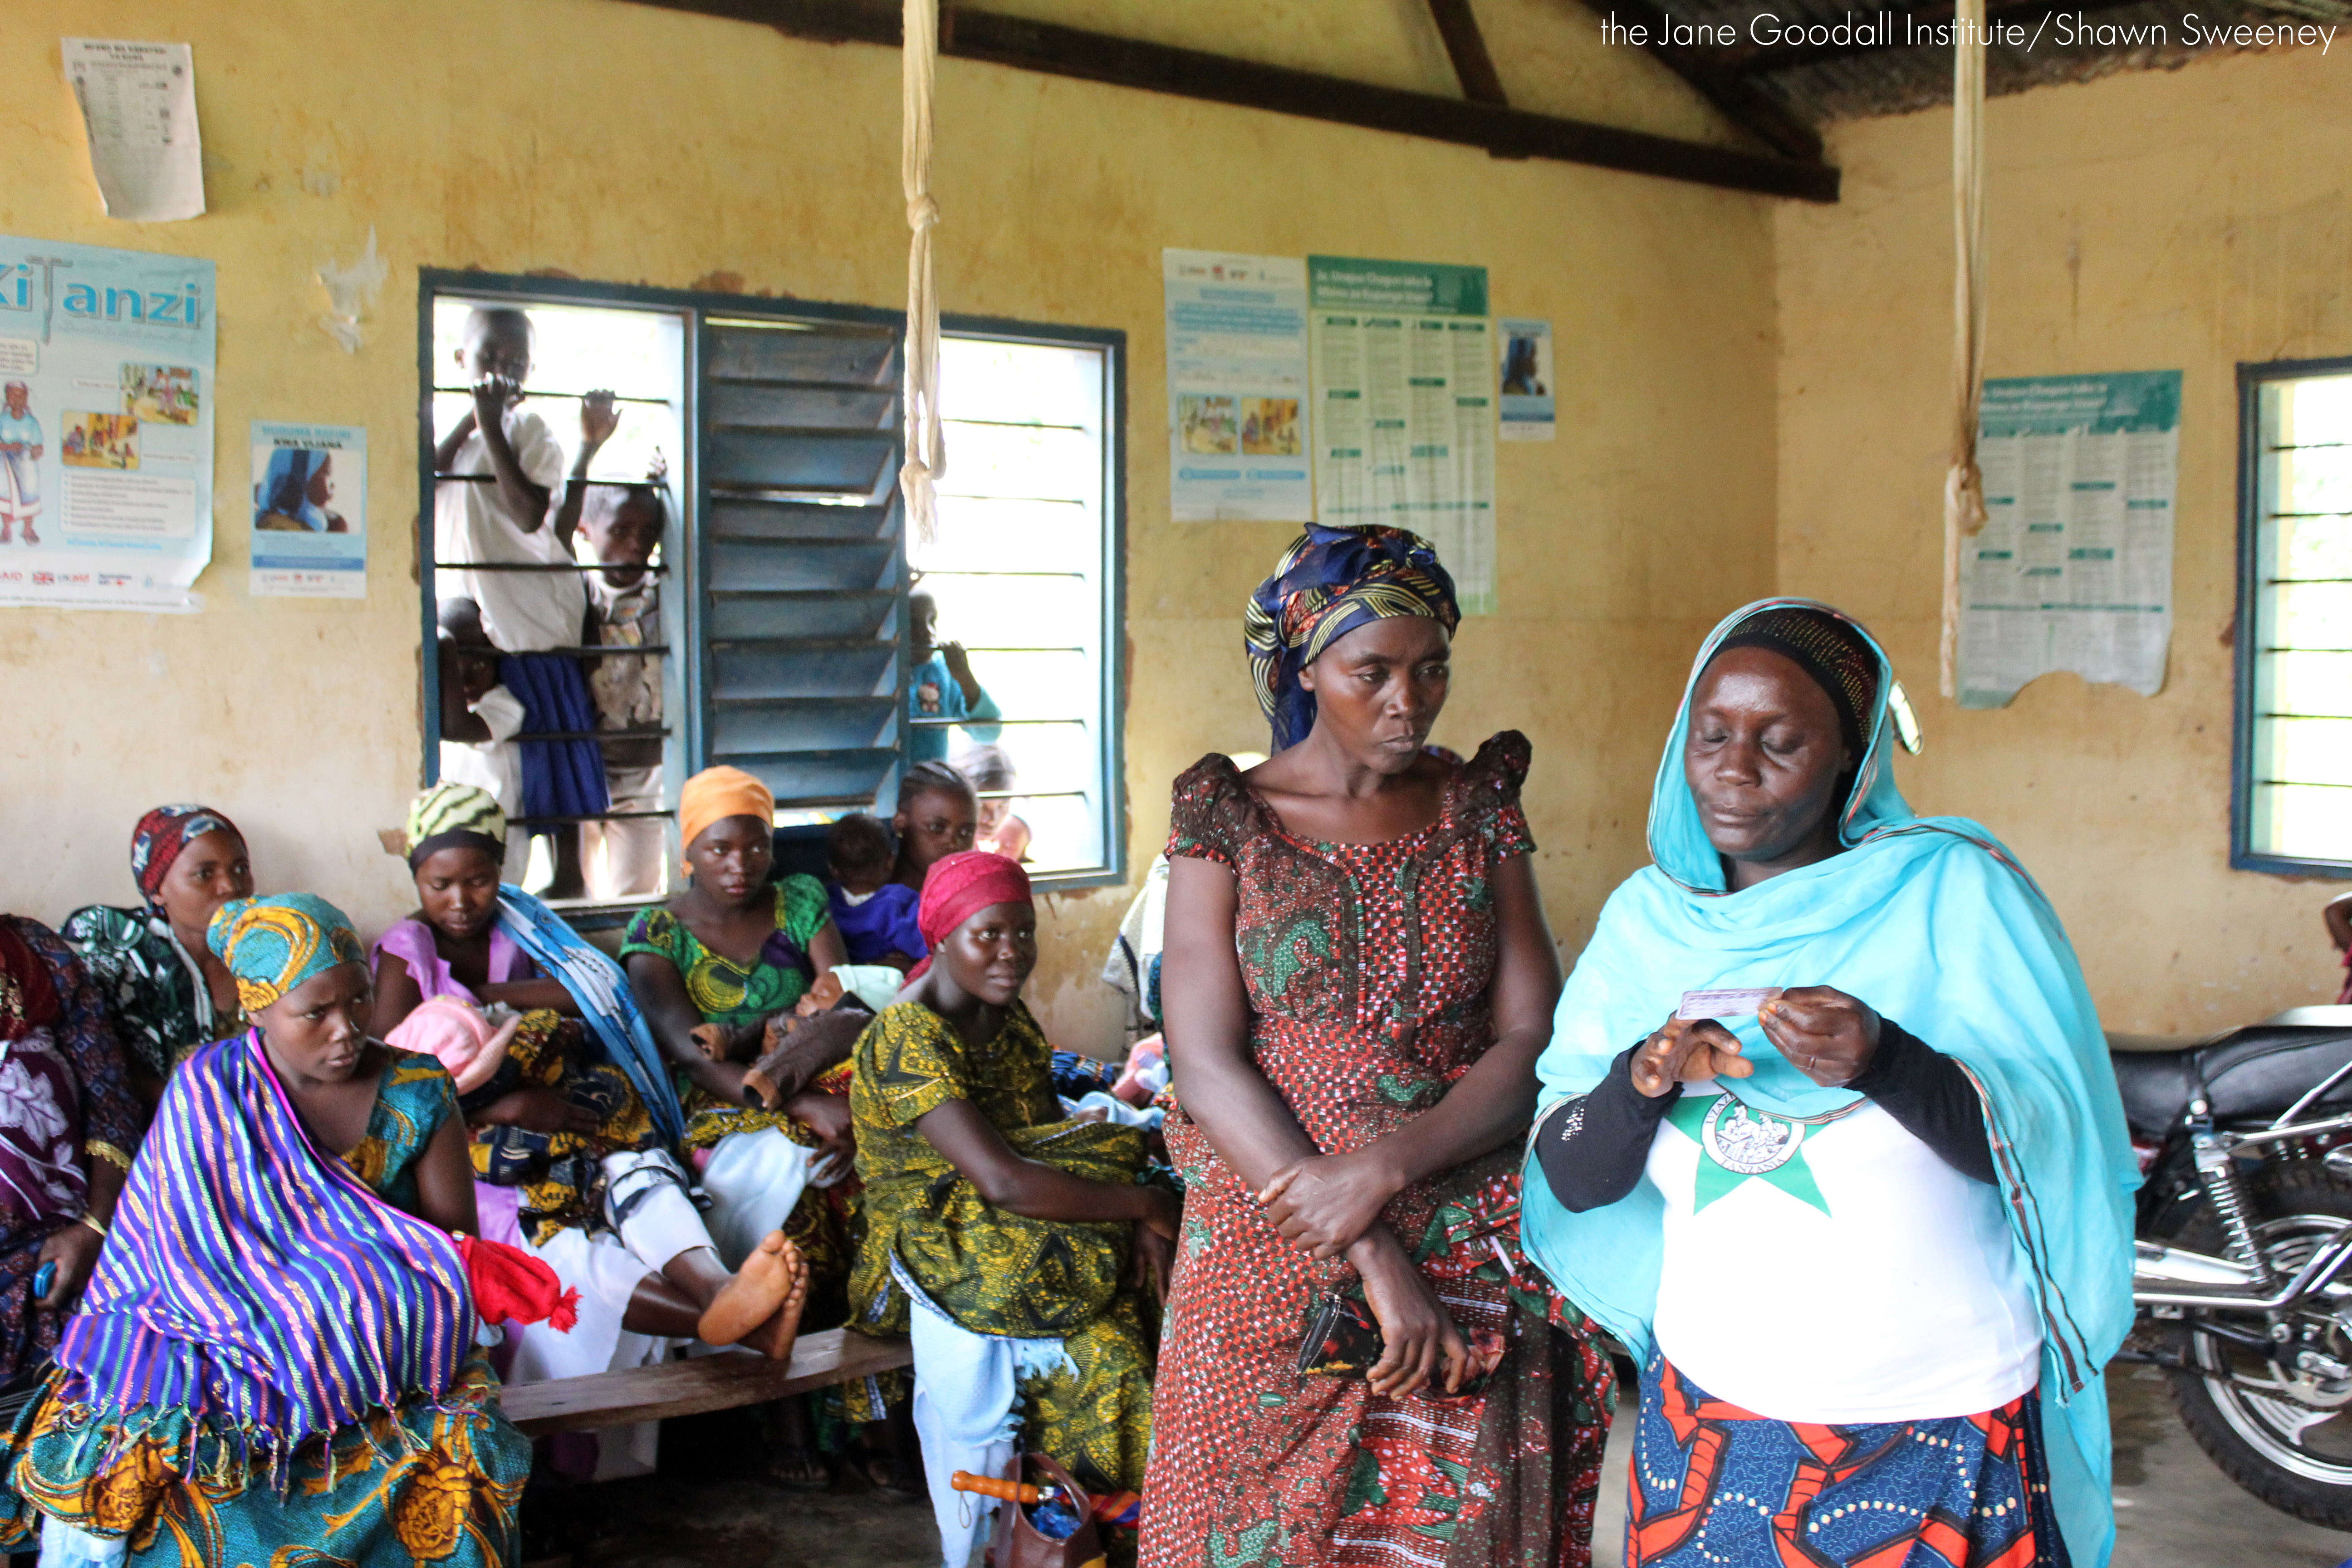 JGI TACARE health education program in Kalinzi Village